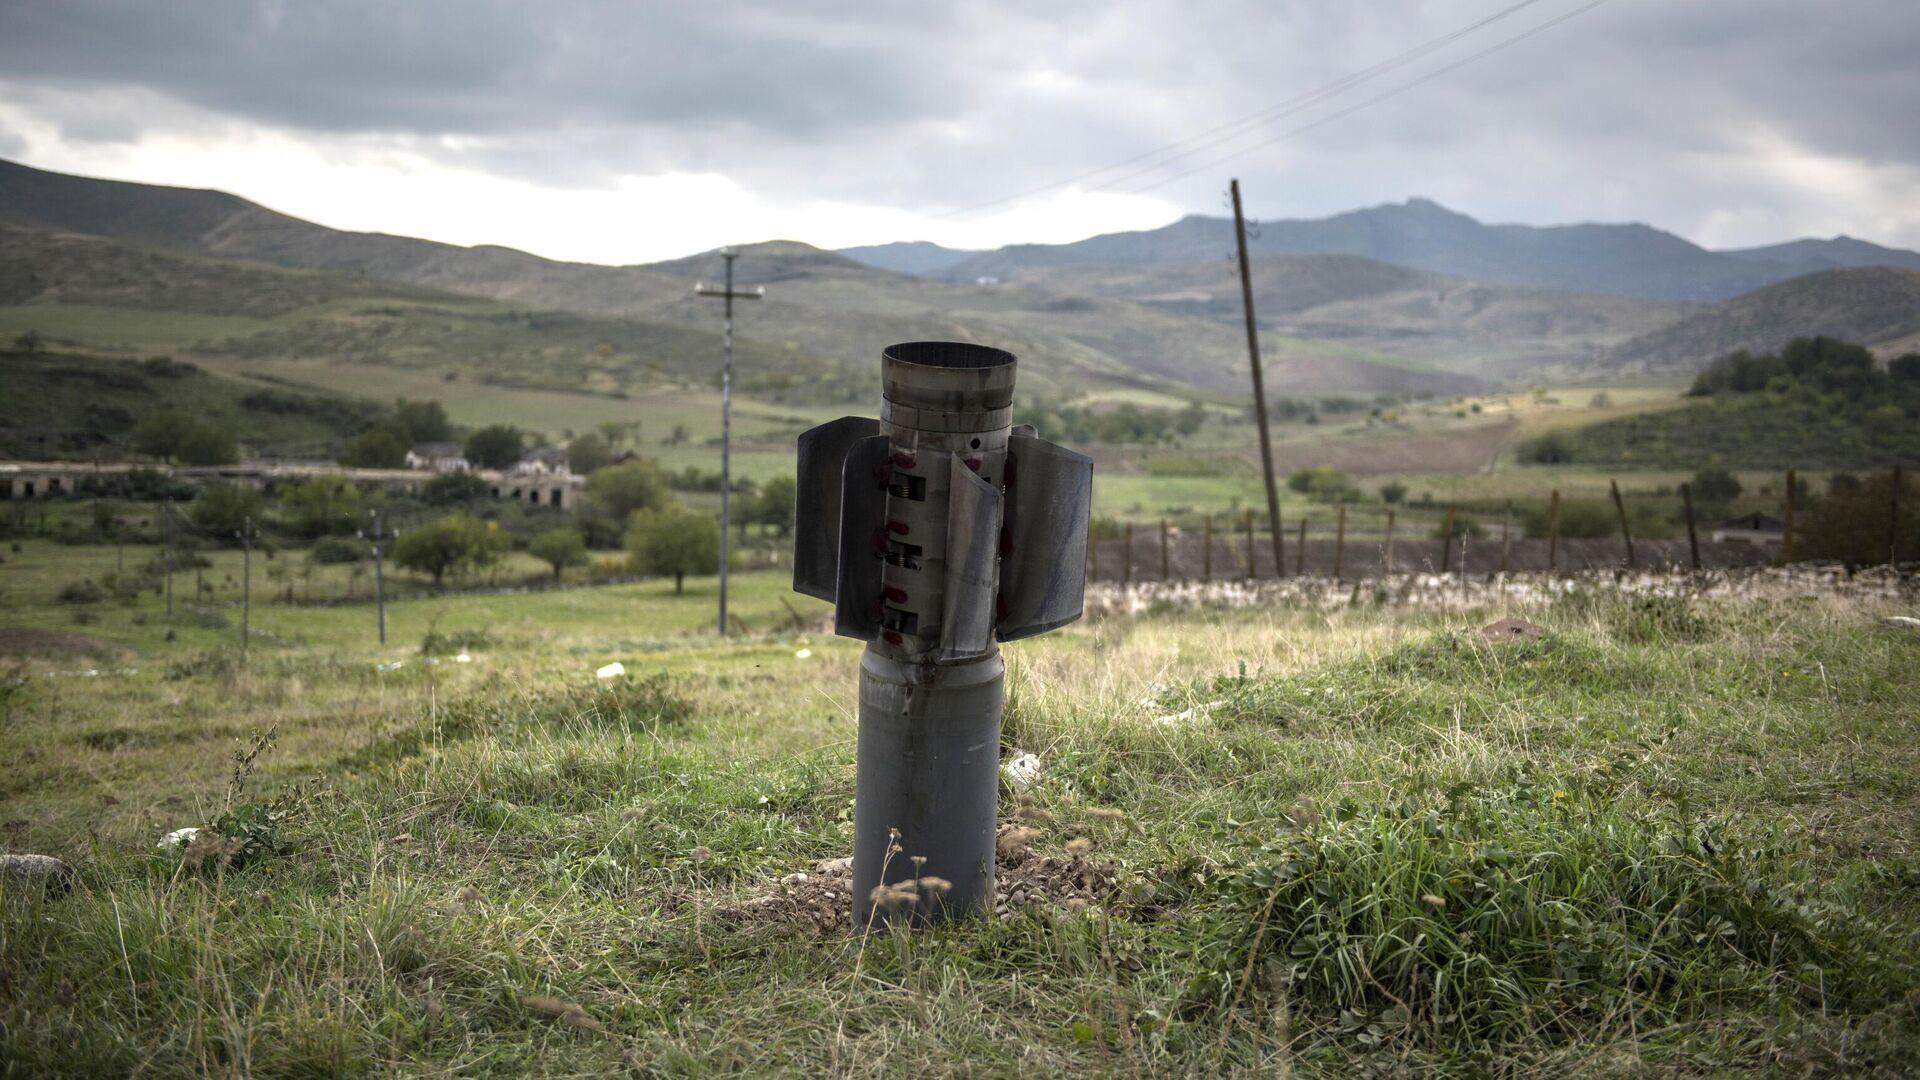 Неразорвавшийся снаряд в Карабахе - РИА Новости, 1920, 19.10.2020